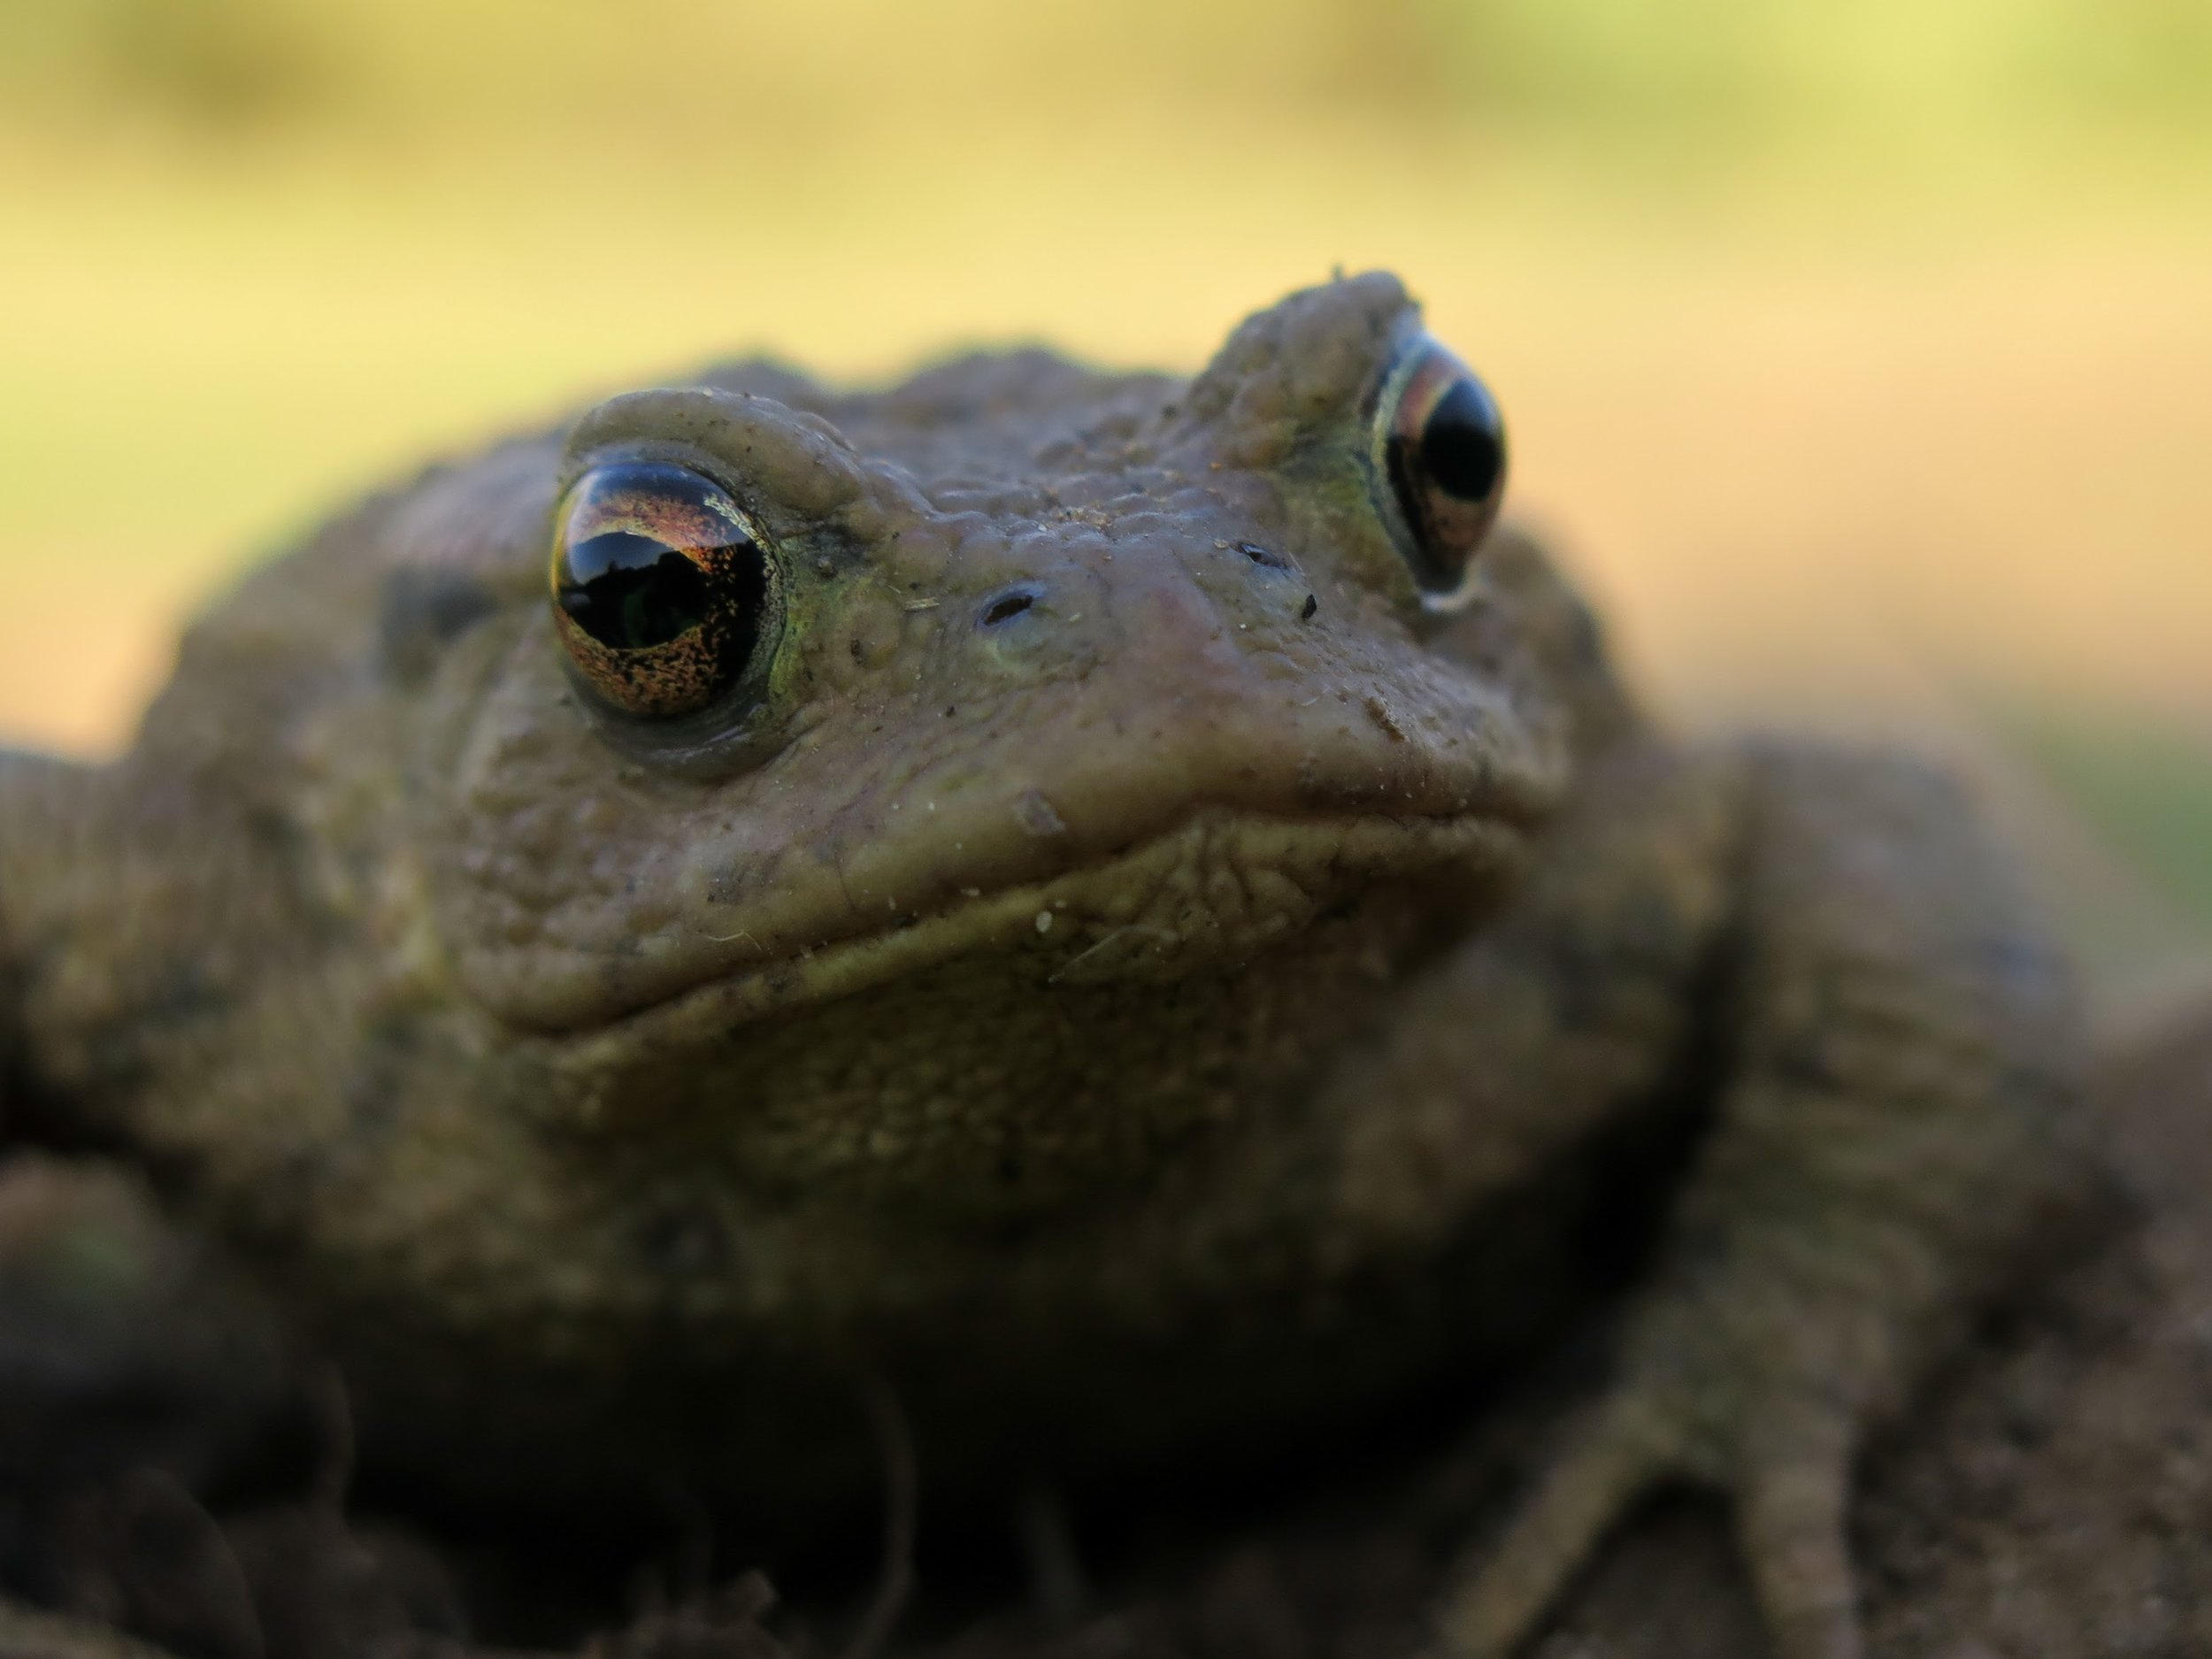 Common toad captured during amphibian surveys